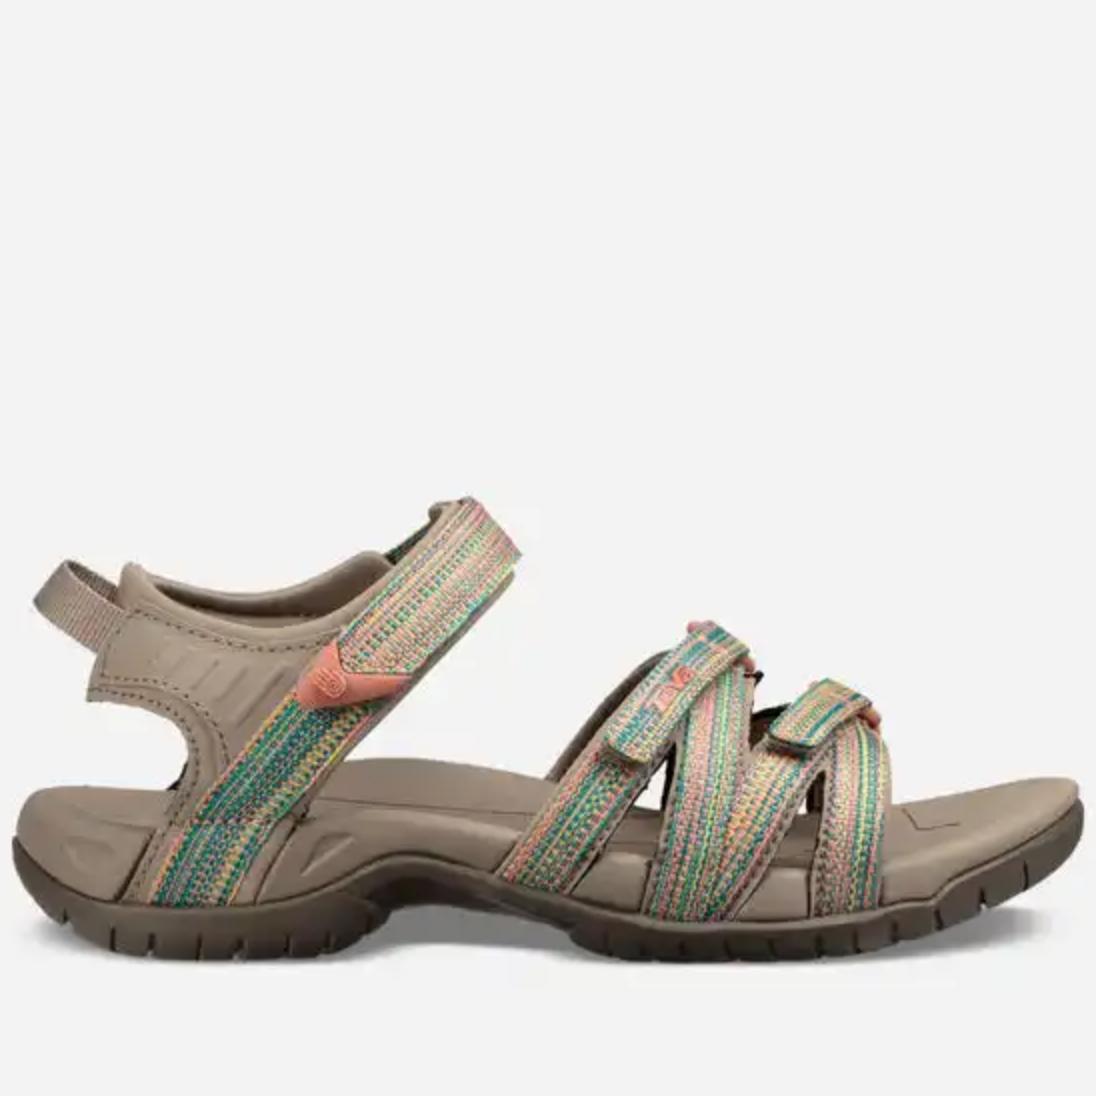 299a81c2d35 Teva Women s Tirra Sandal Taupe Multi